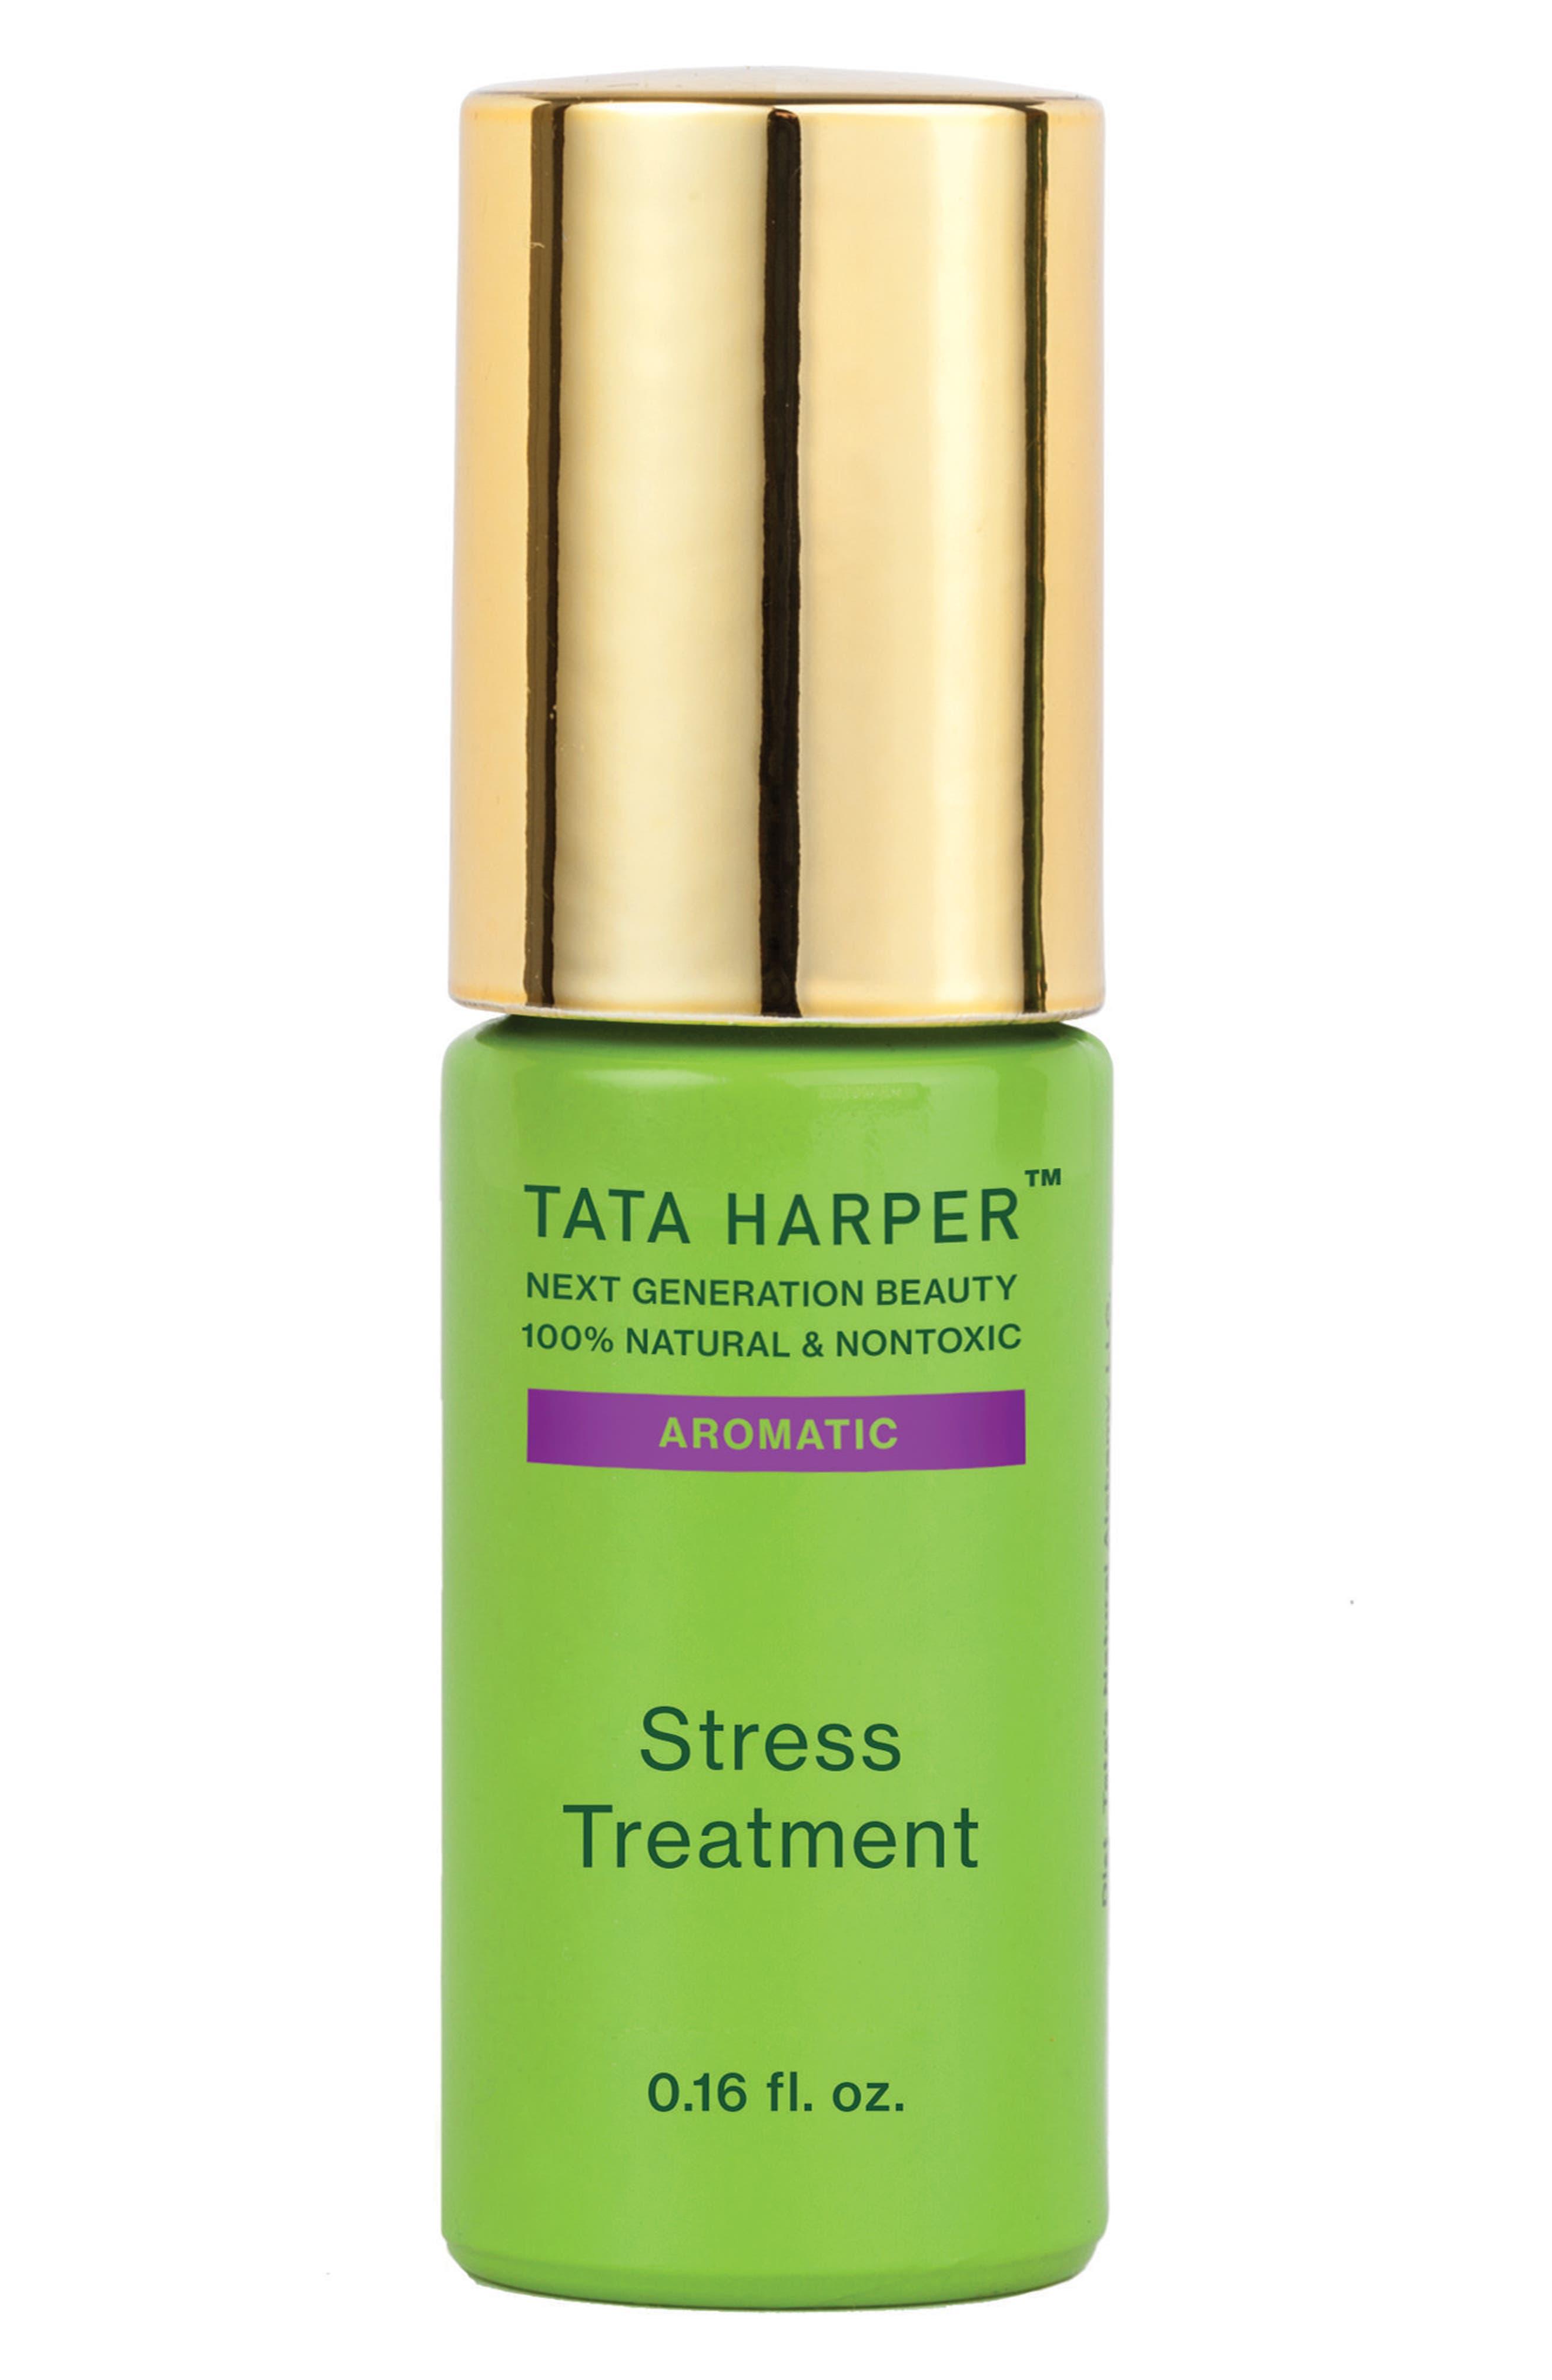 Tata Harper Skincare Aromatic Stress Treatment